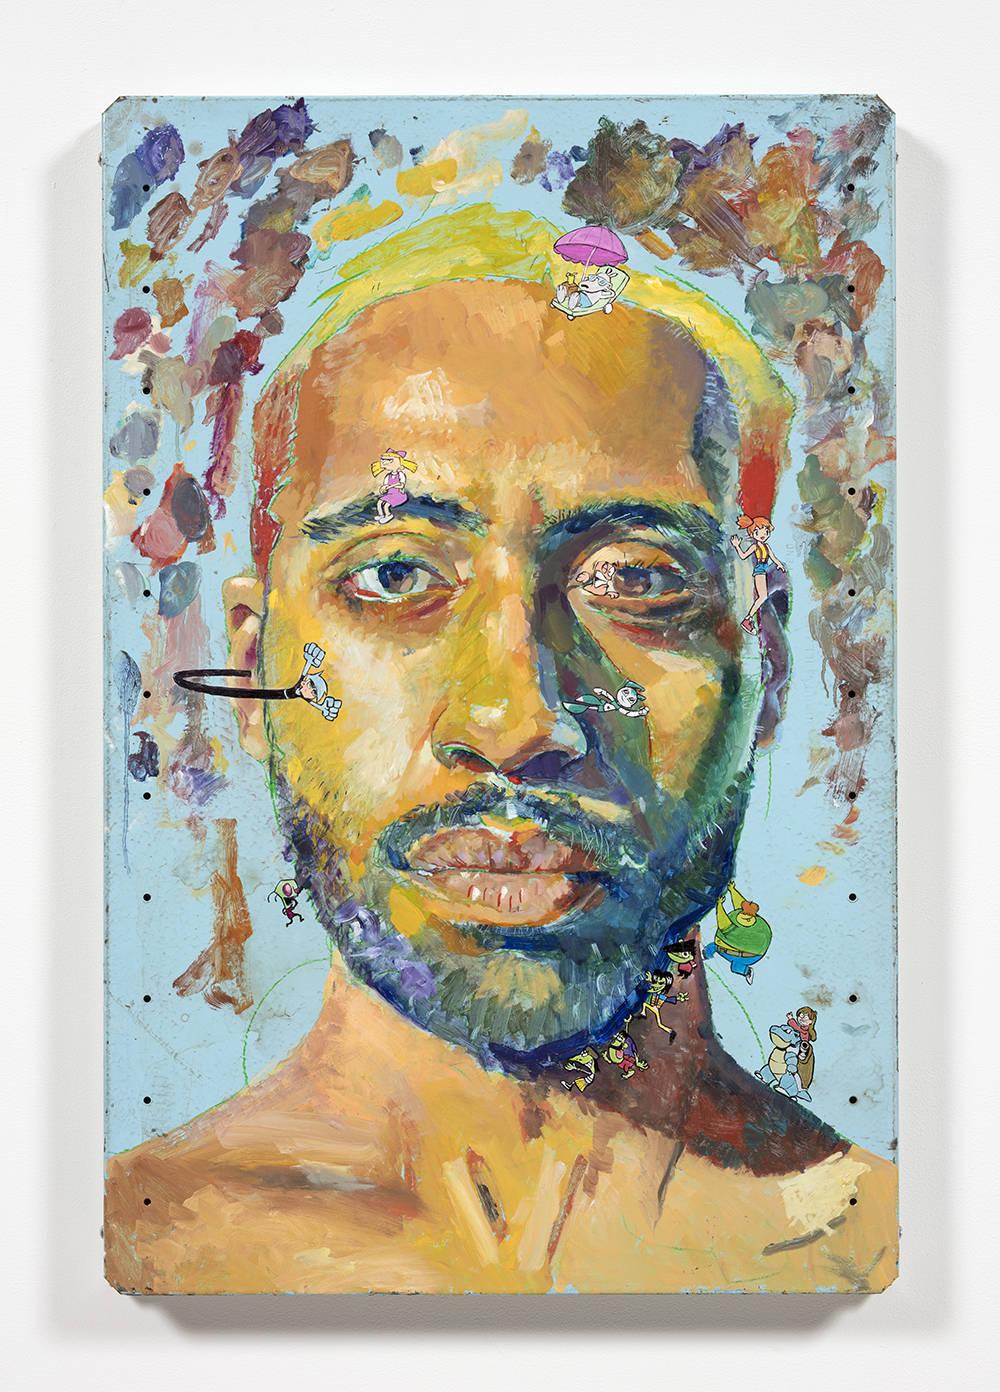 Untitled Self-Portrait 2 (rocko, helga, misty, danny phantom, jenny, zim, the gangreen gang, mabel and blastoise)